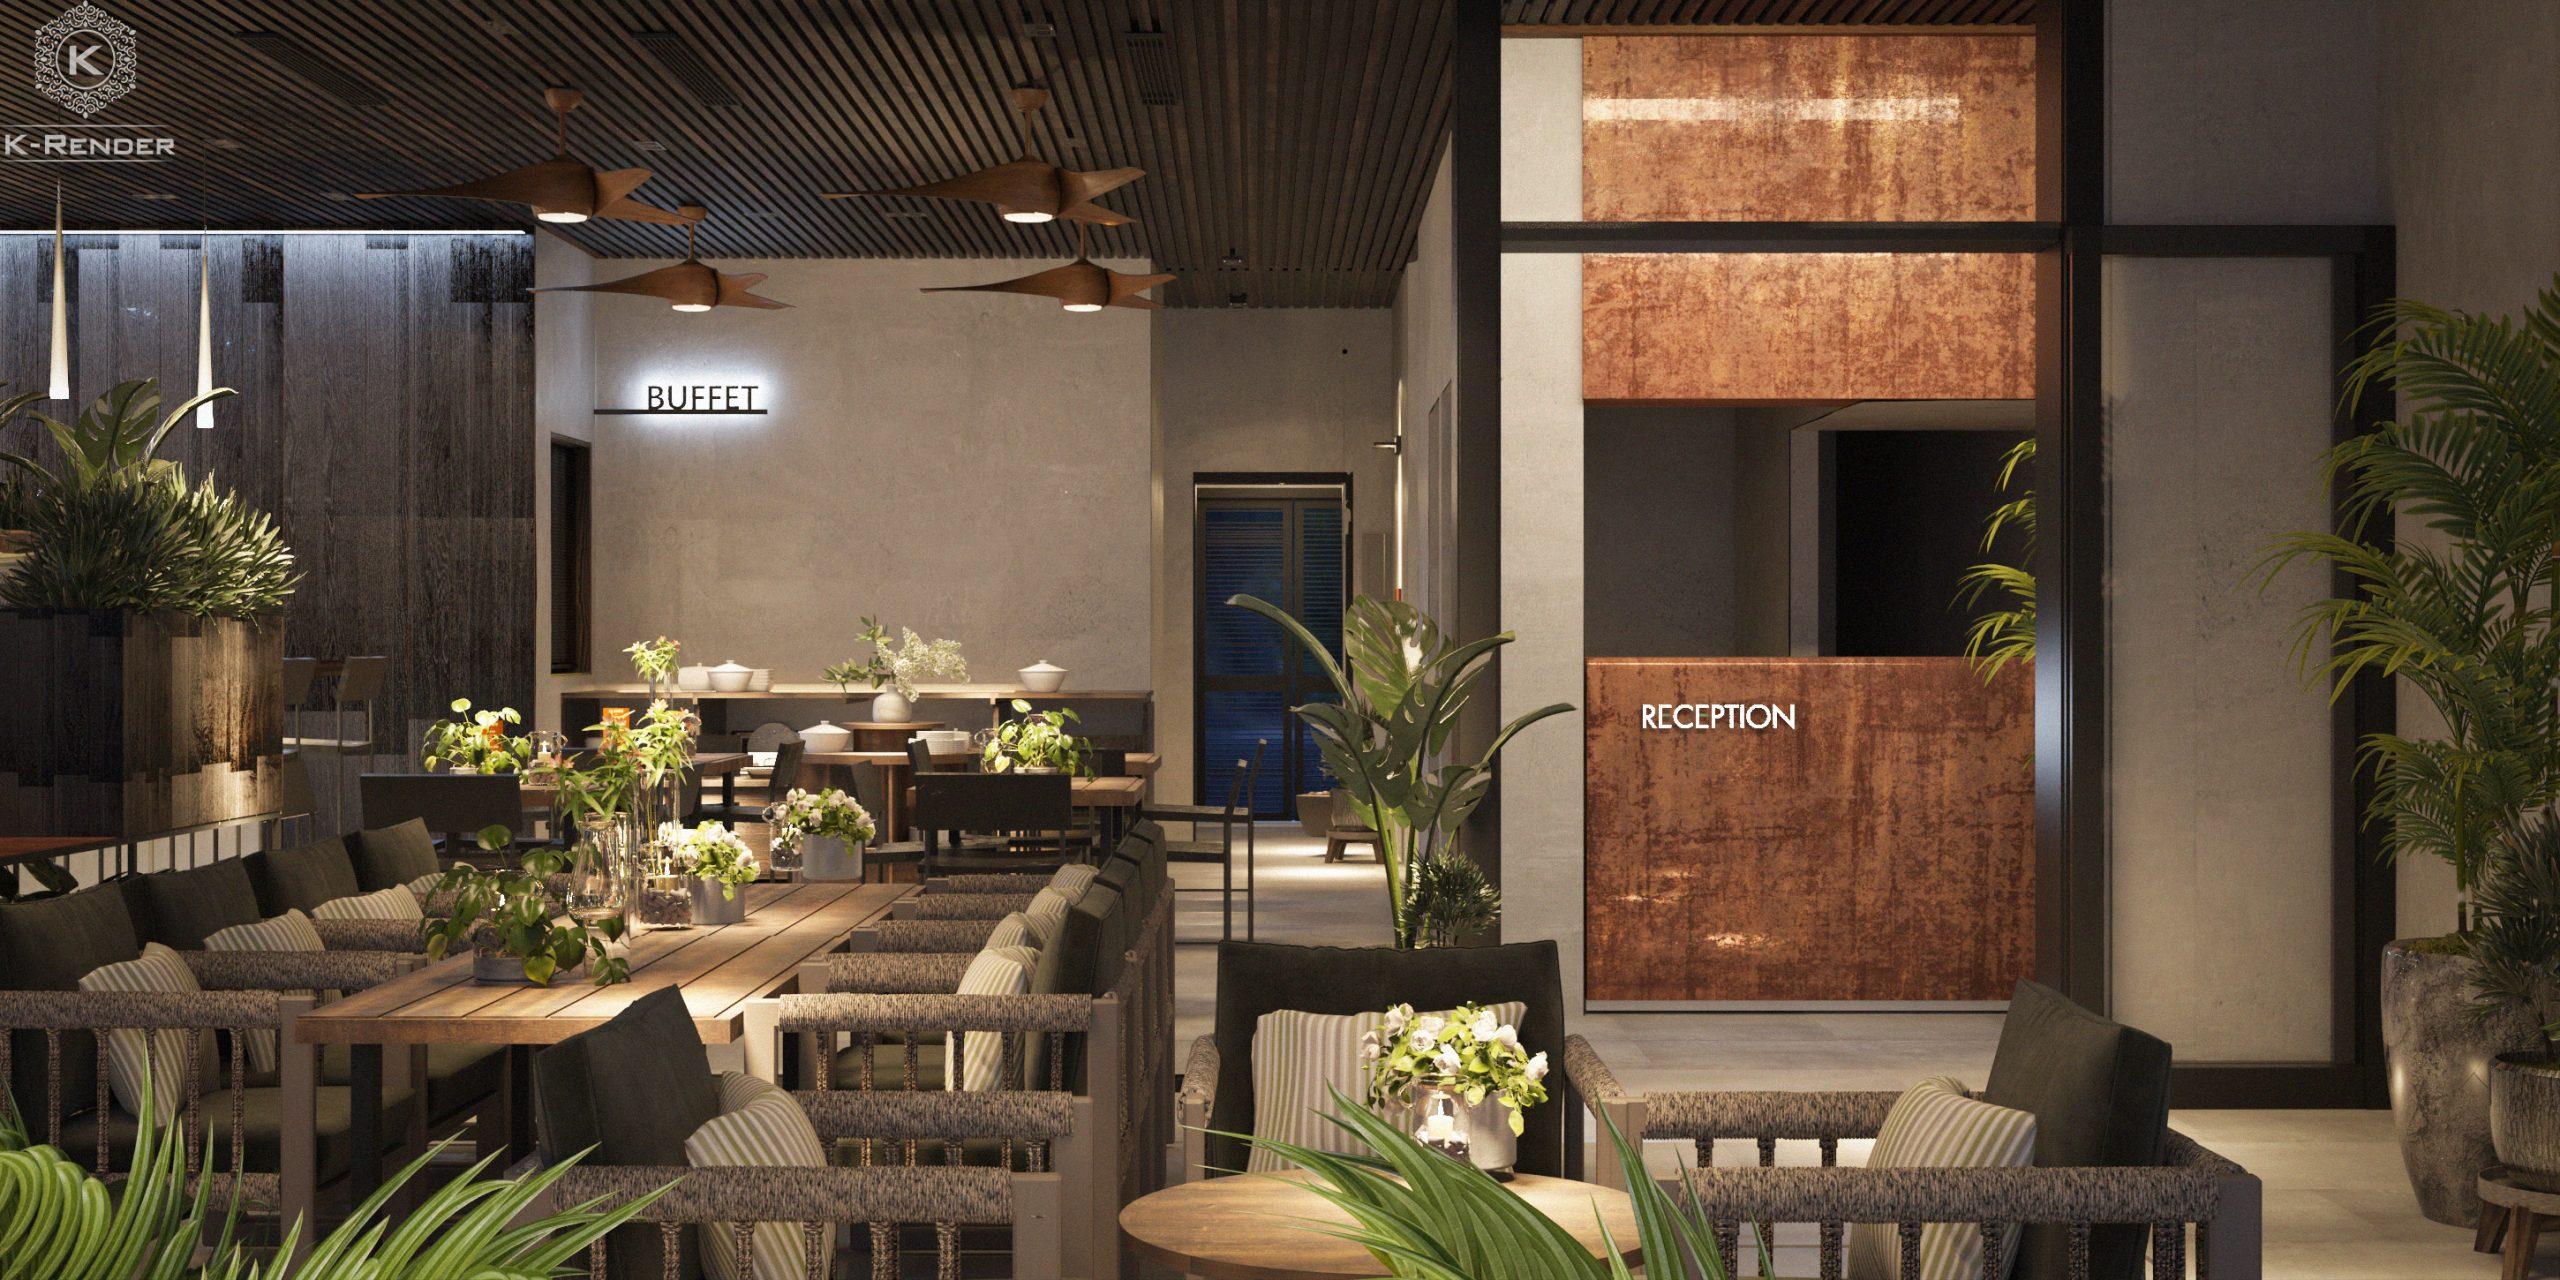 the-summer-bar-and-restaurant-project-k-render-studio-5